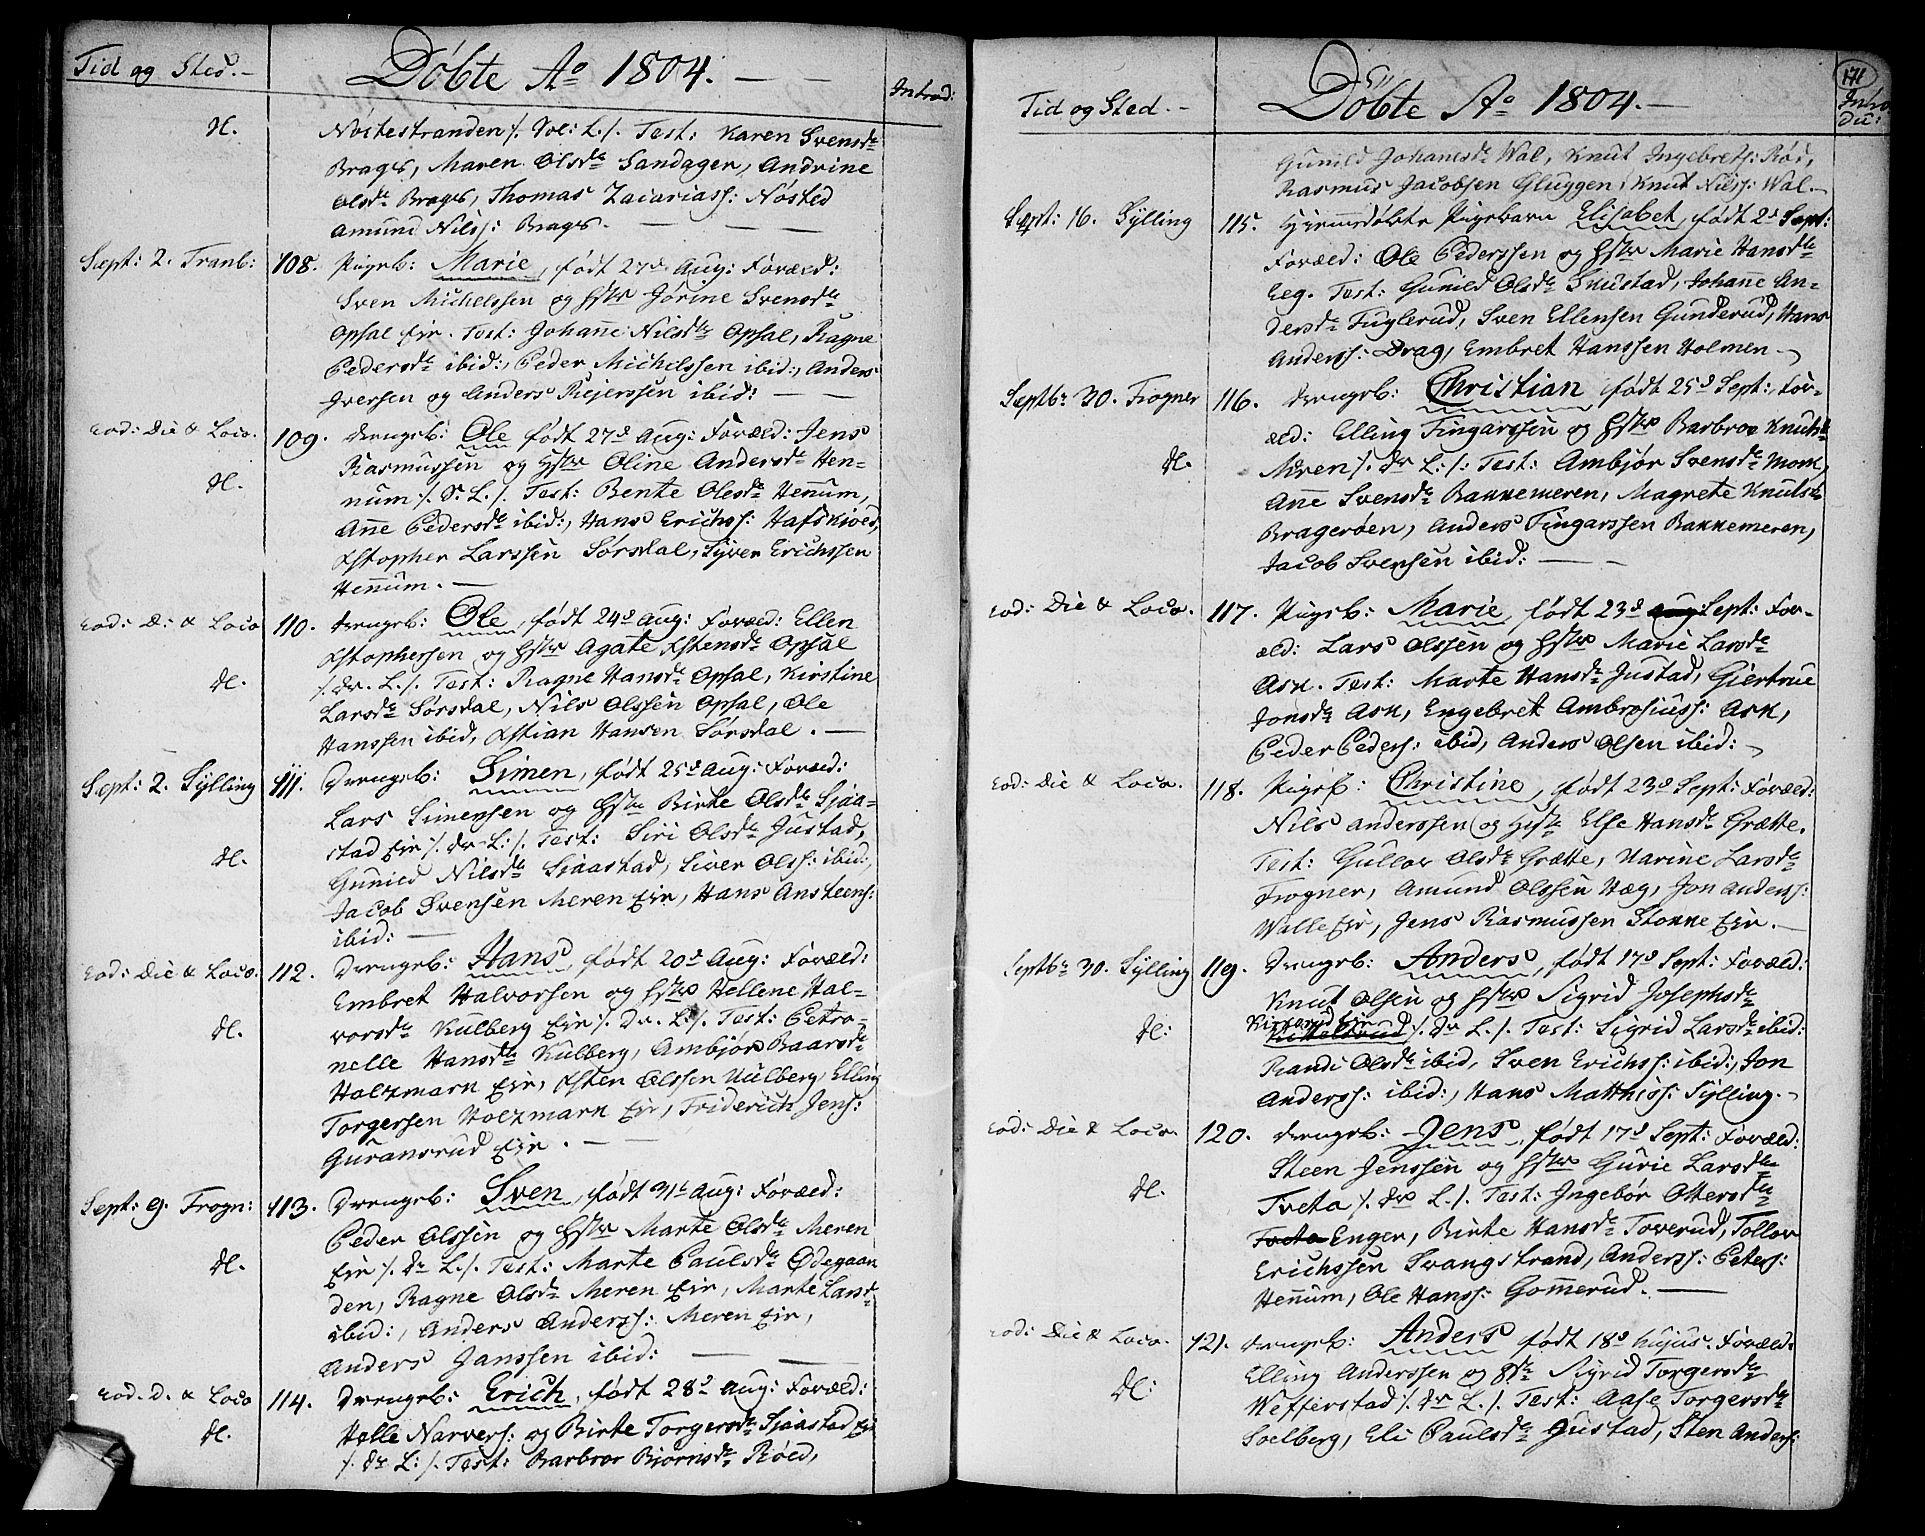 SAKO, Lier kirkebøker, F/Fa/L0007: Ministerialbok nr. I 7, 1794-1813, s. 171